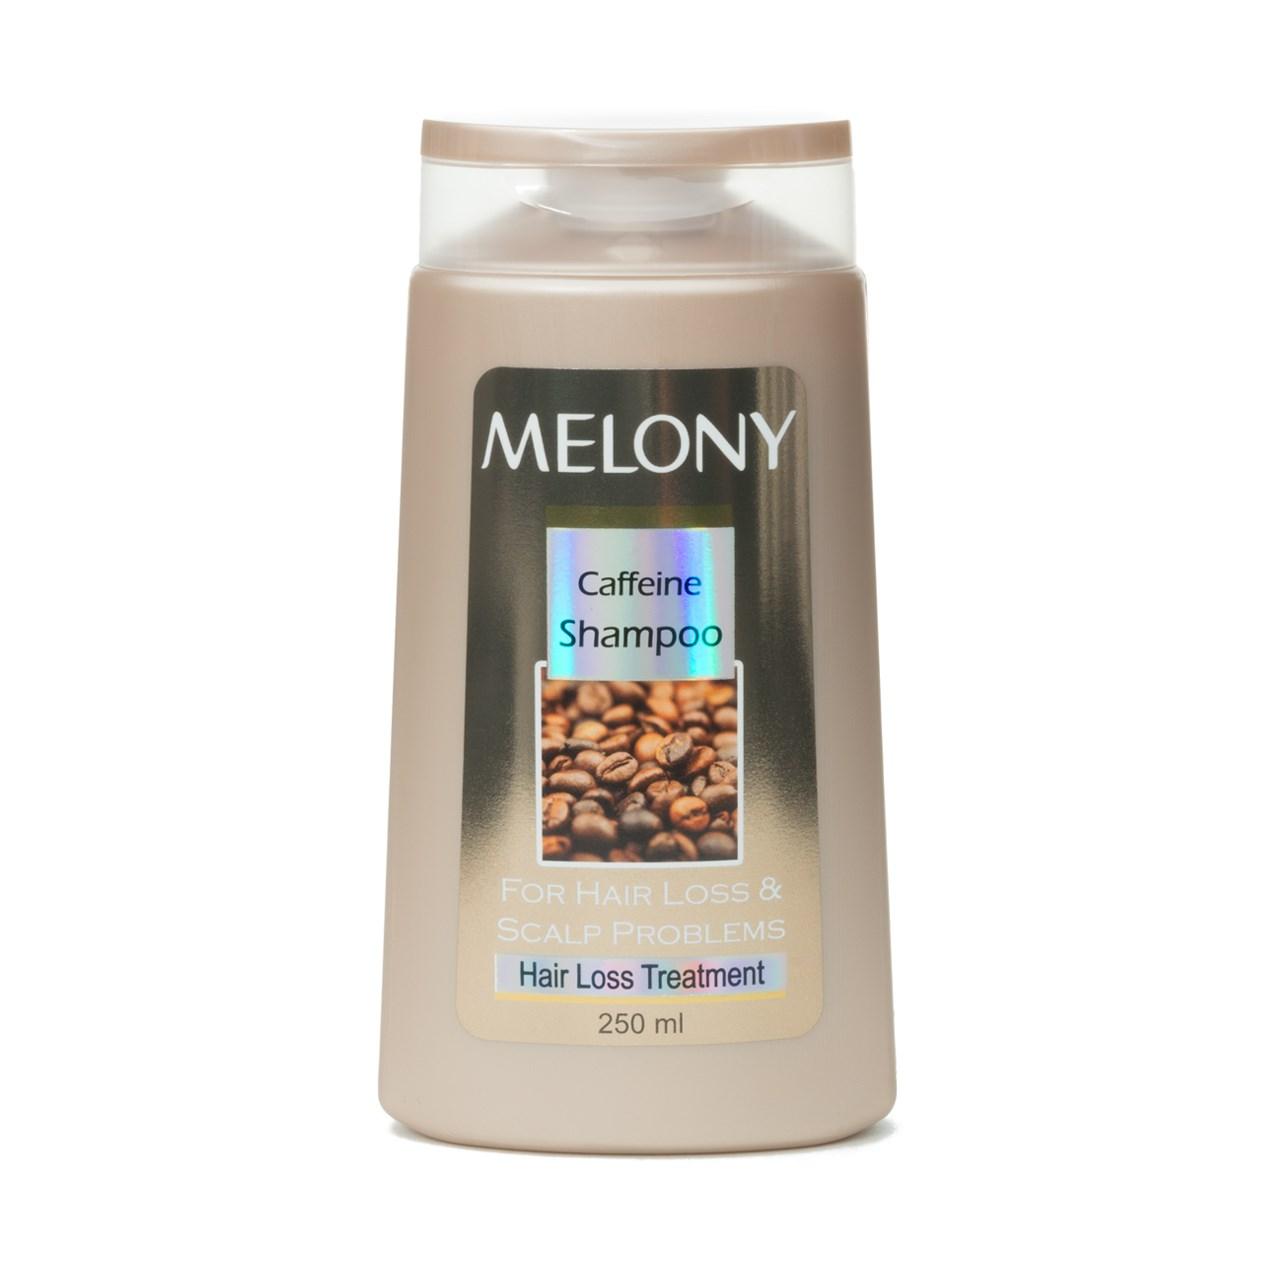 شامپو  ضد ریزش کافئین ملونی  مدل Hair Loss treatment caffeine حجم 250 میلی لیتر